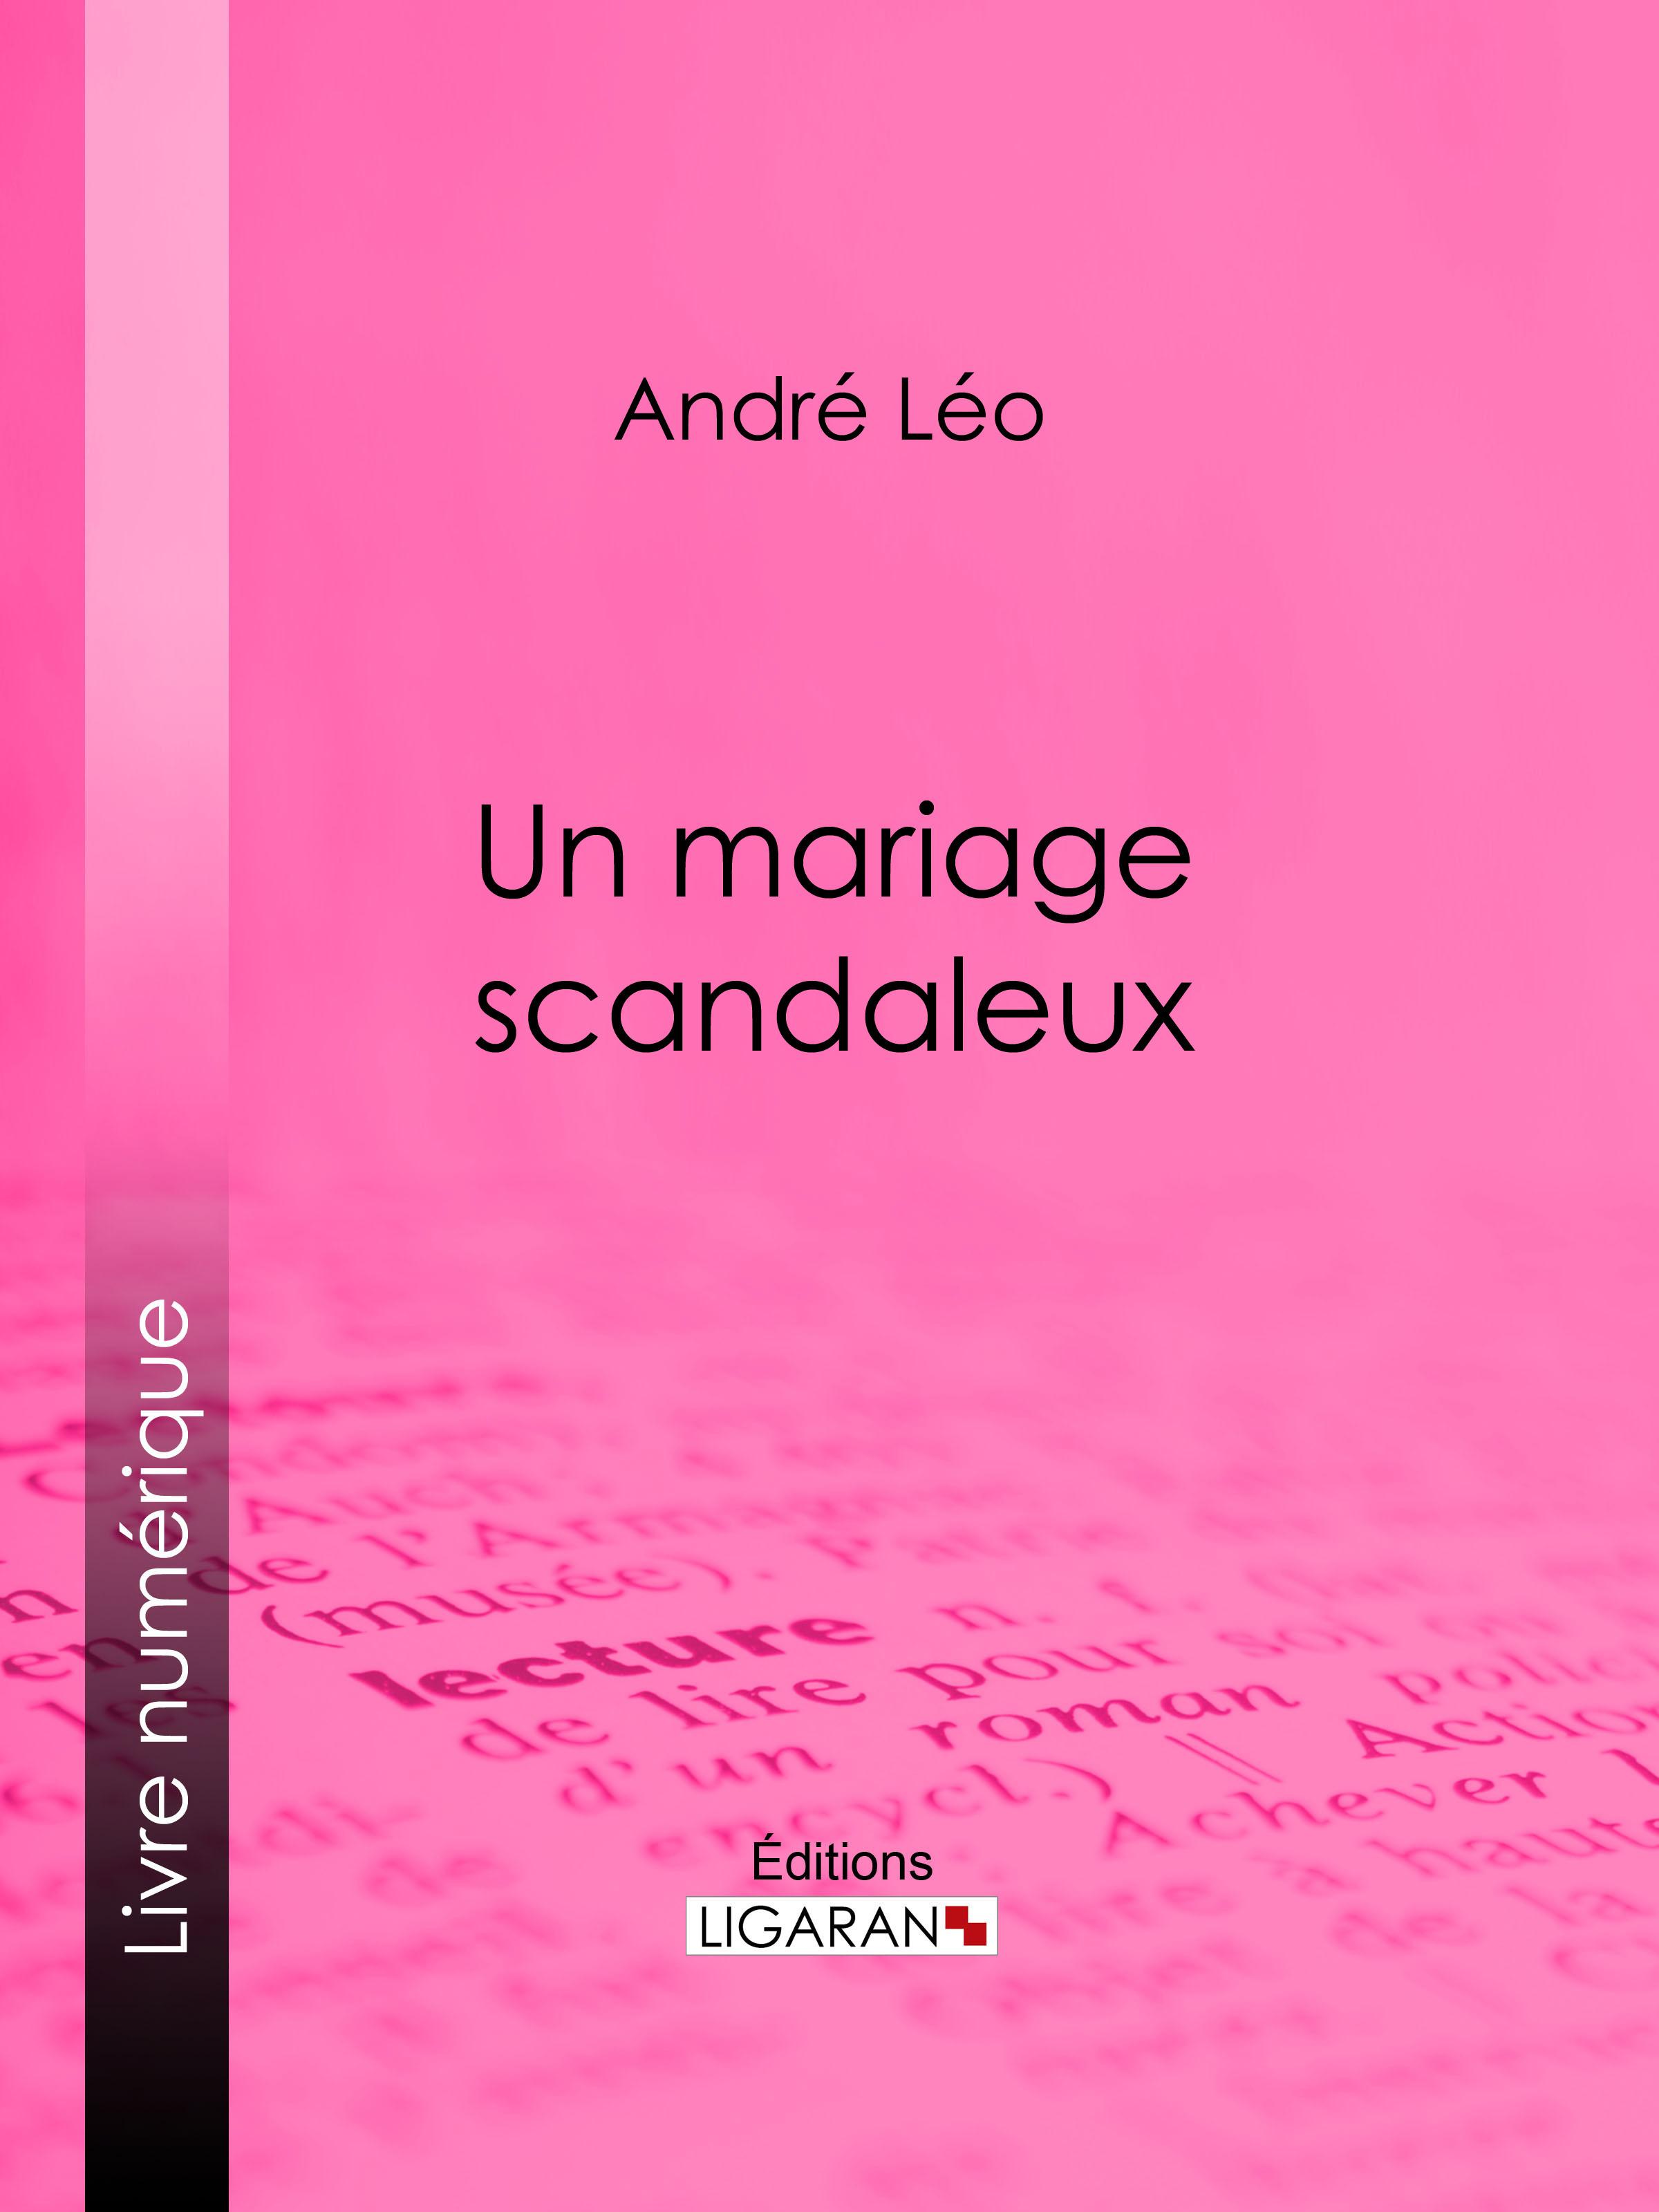 Un mariage scandaleux